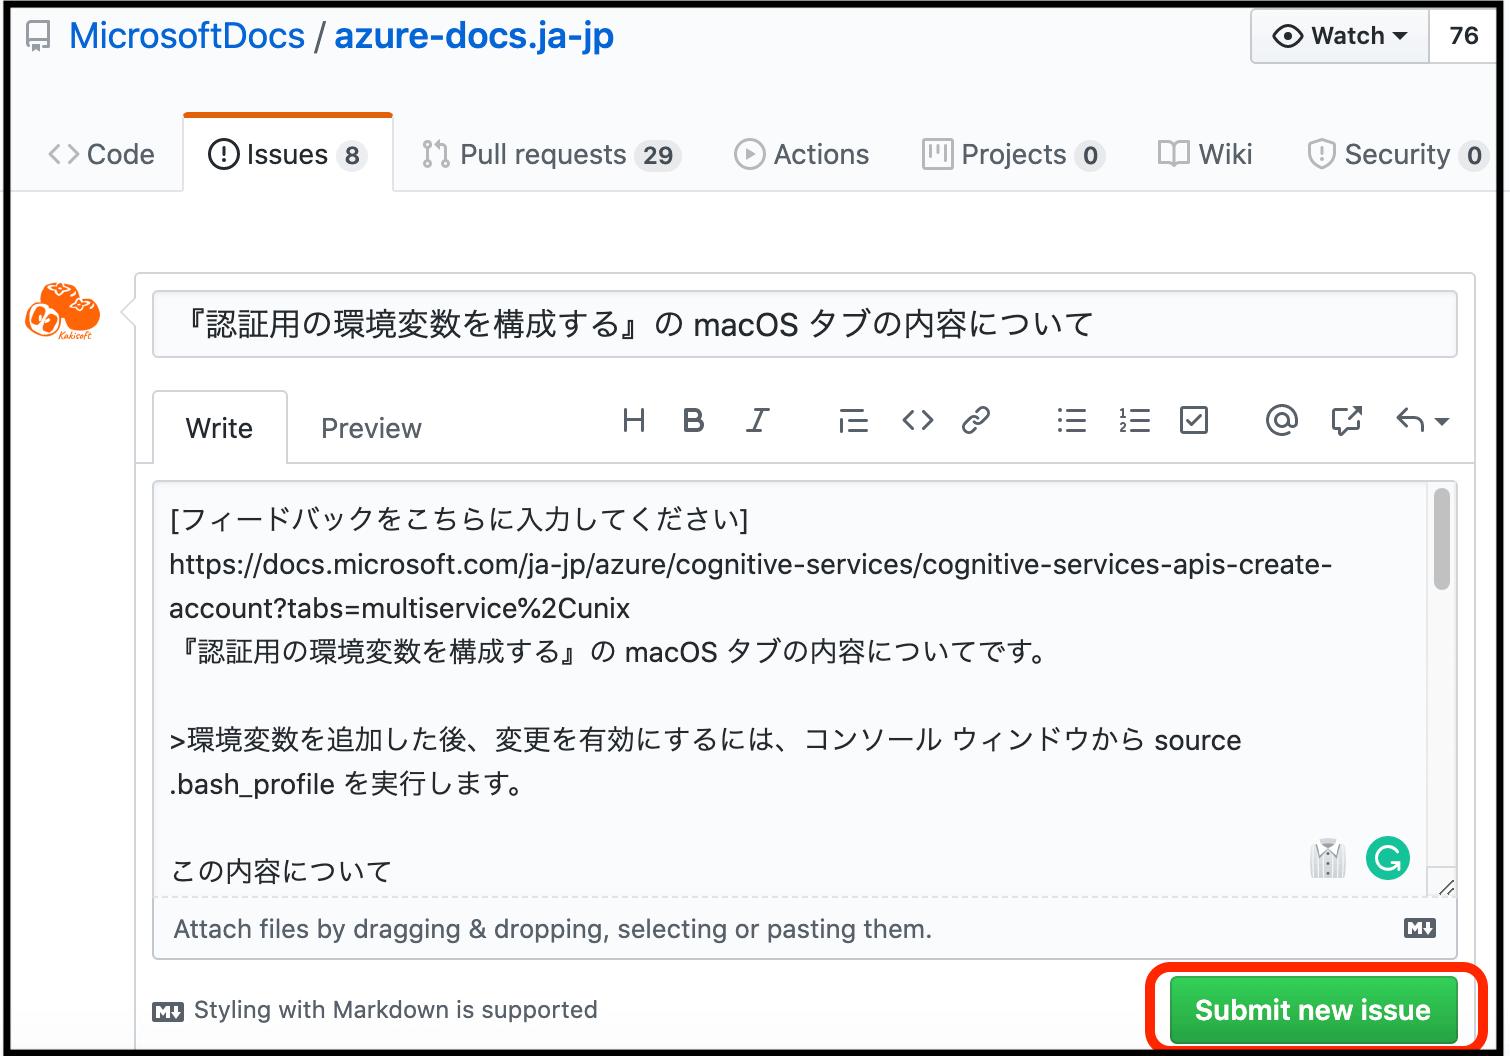 MicrosoftDocs に送った内容修正の提案が採用されて、本家にも反映された話。_02